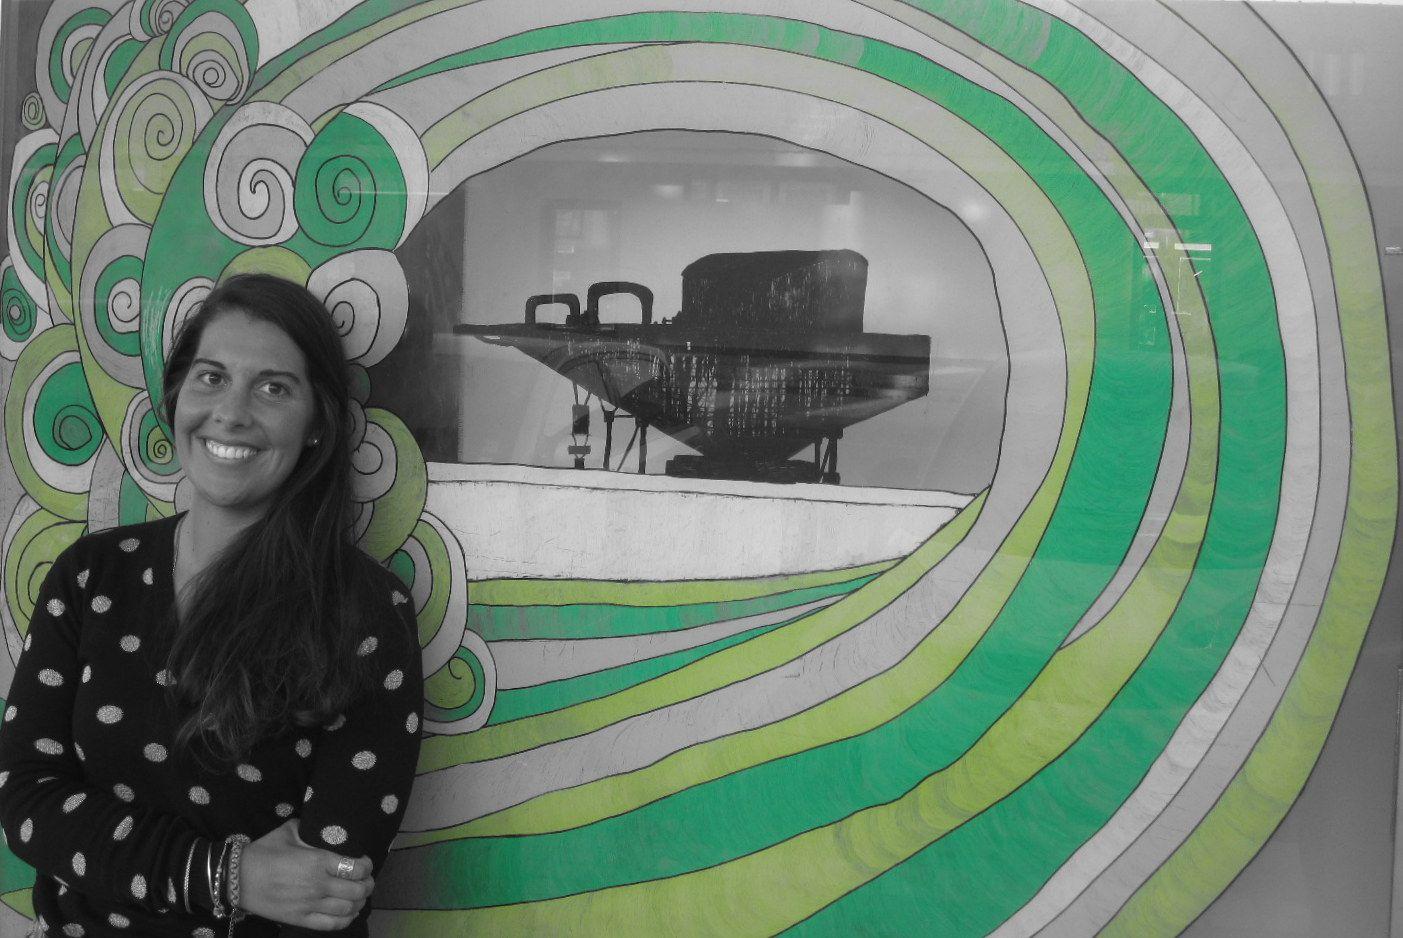 Filipa Costa´s work at Surf Leça. 2013. photo by: Céu Silva. Copyright. Please do not remove artist´s name.